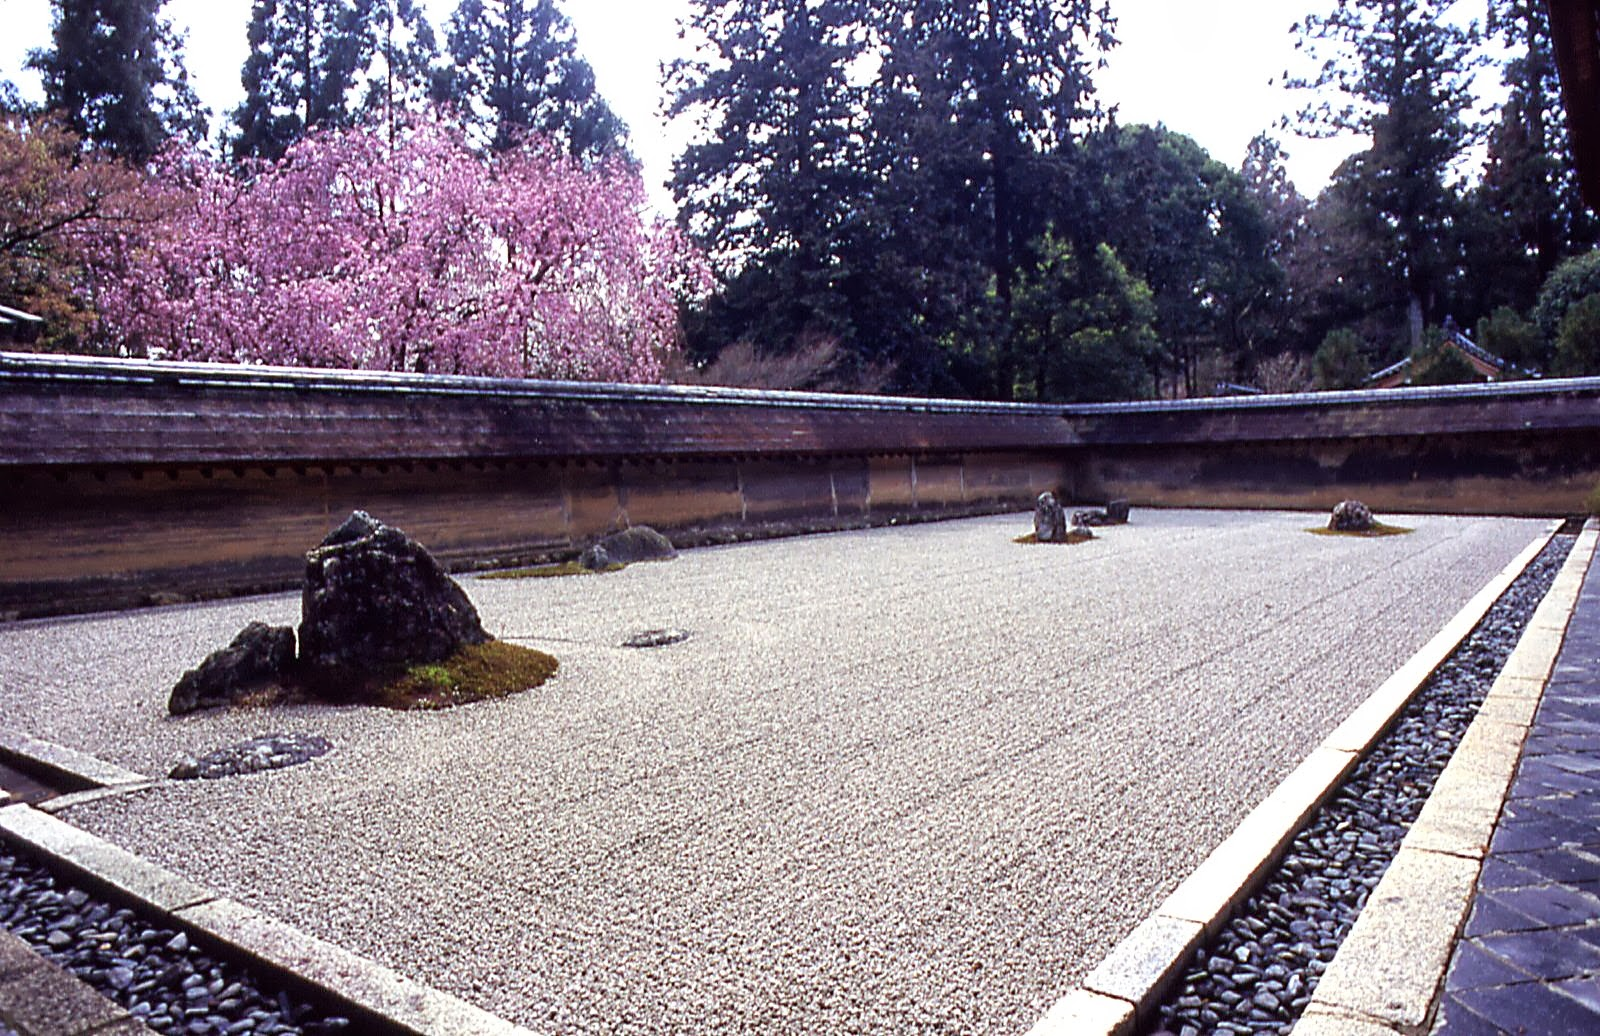 jap n cultura y arte el jard n japon s el jard n seco o